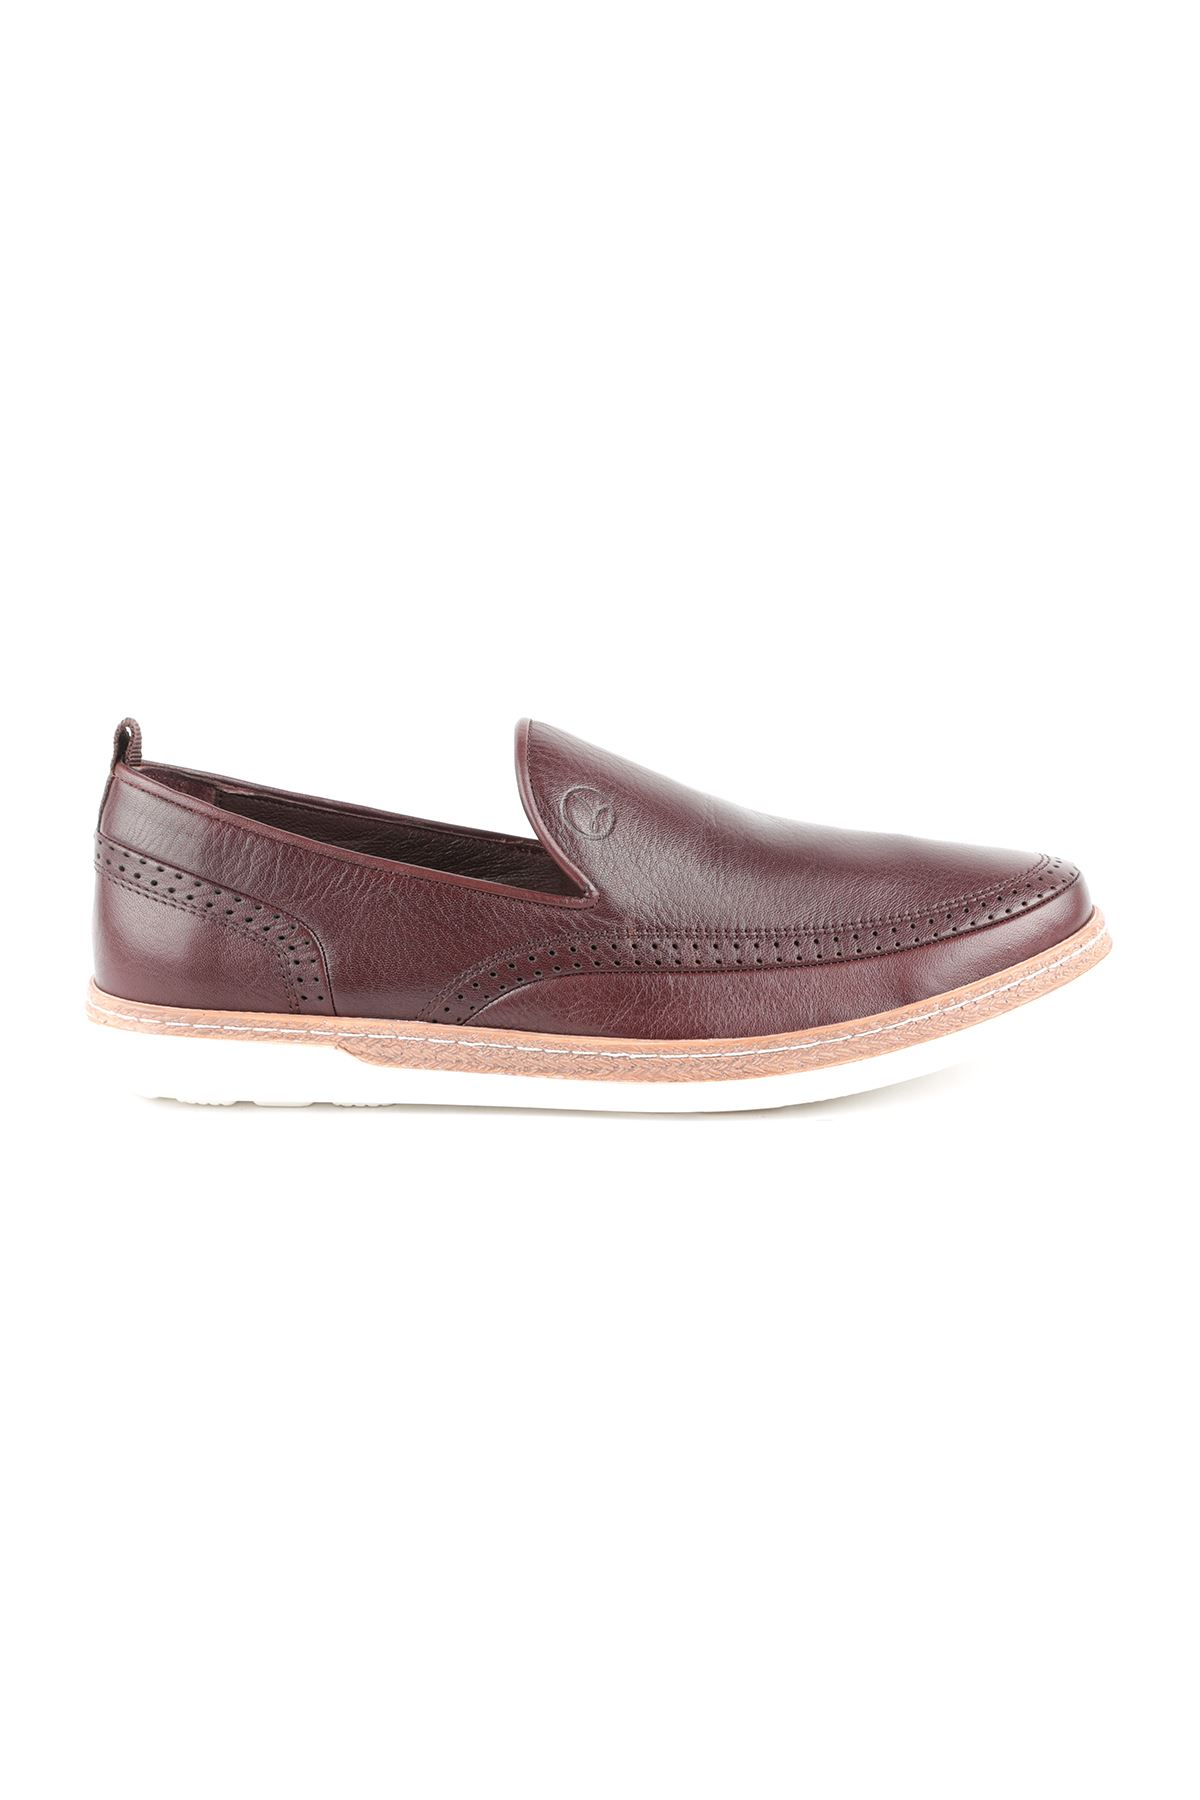 Libero L3658 Brown Loafer Men's Shoes